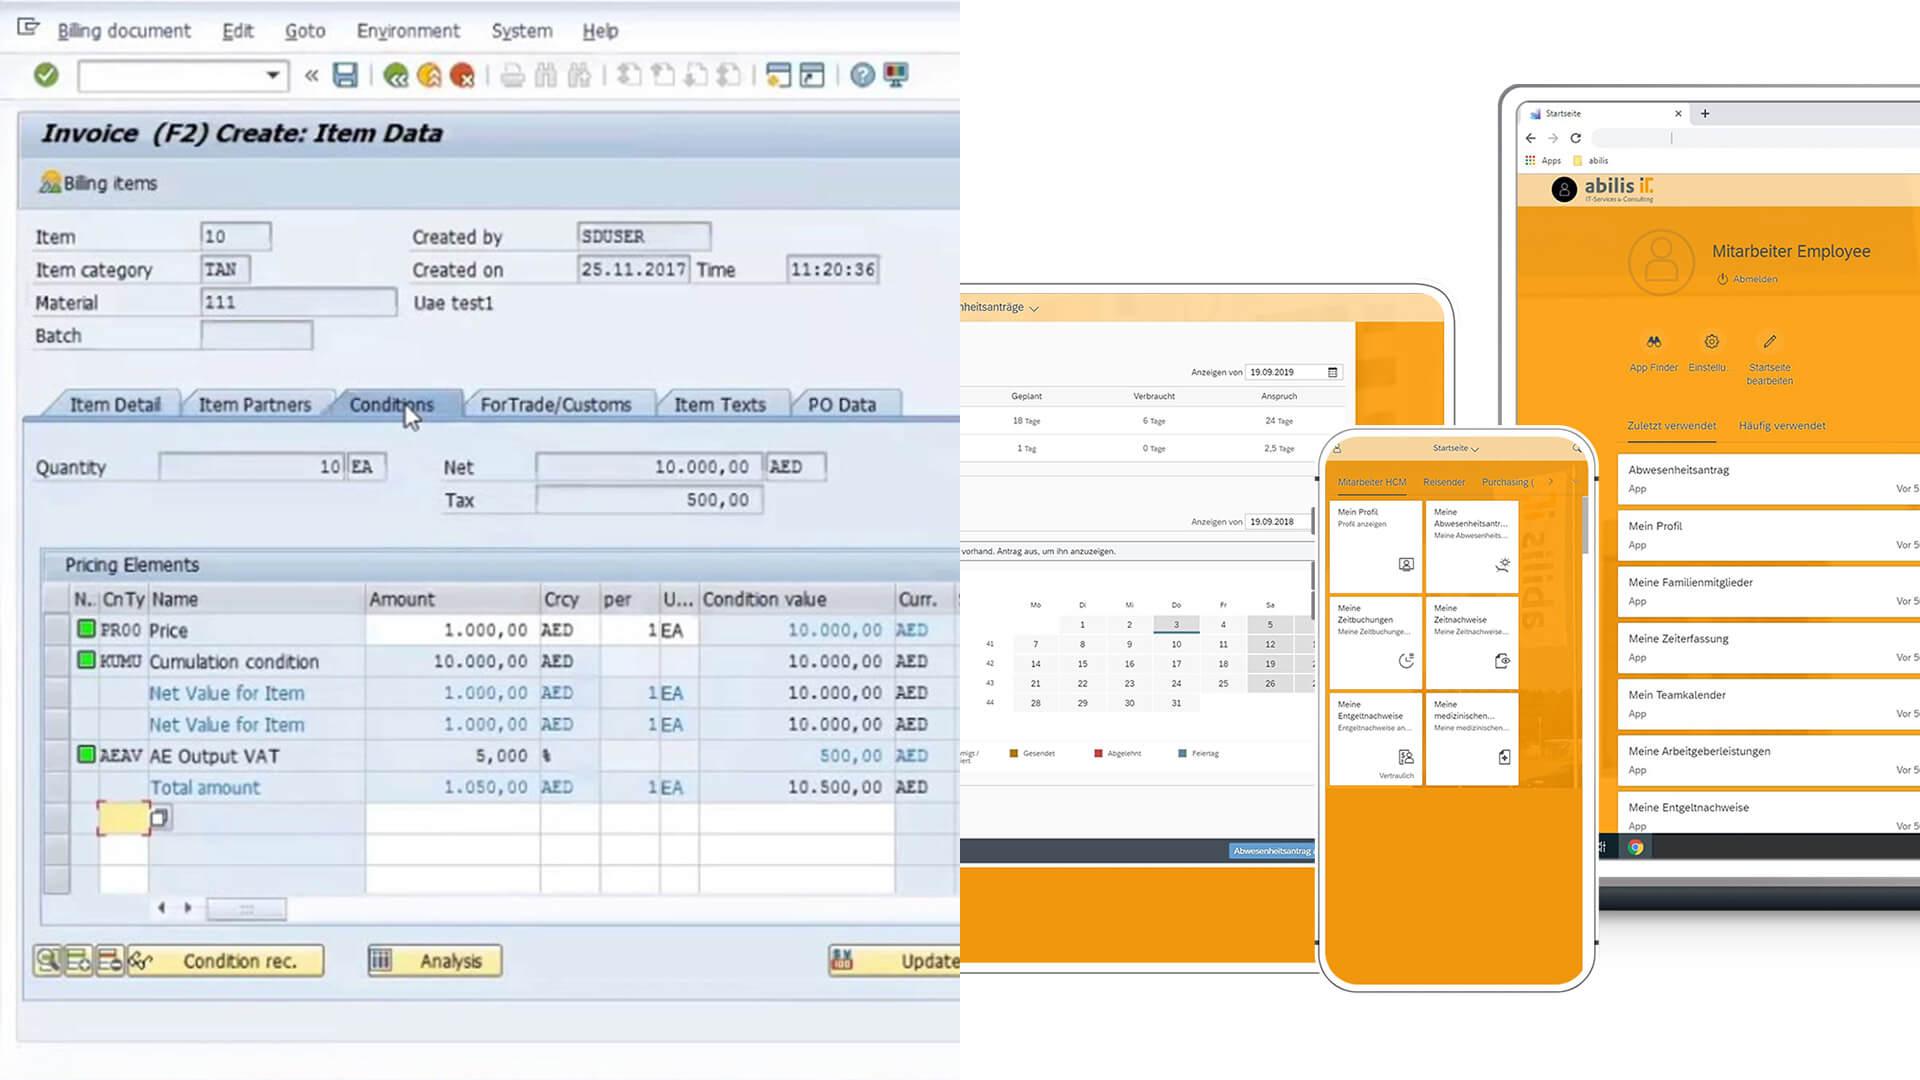 Vergleich Oberfläche SAP ERP ECC 6.0 und SAP Fiori von SAP S/4HANA